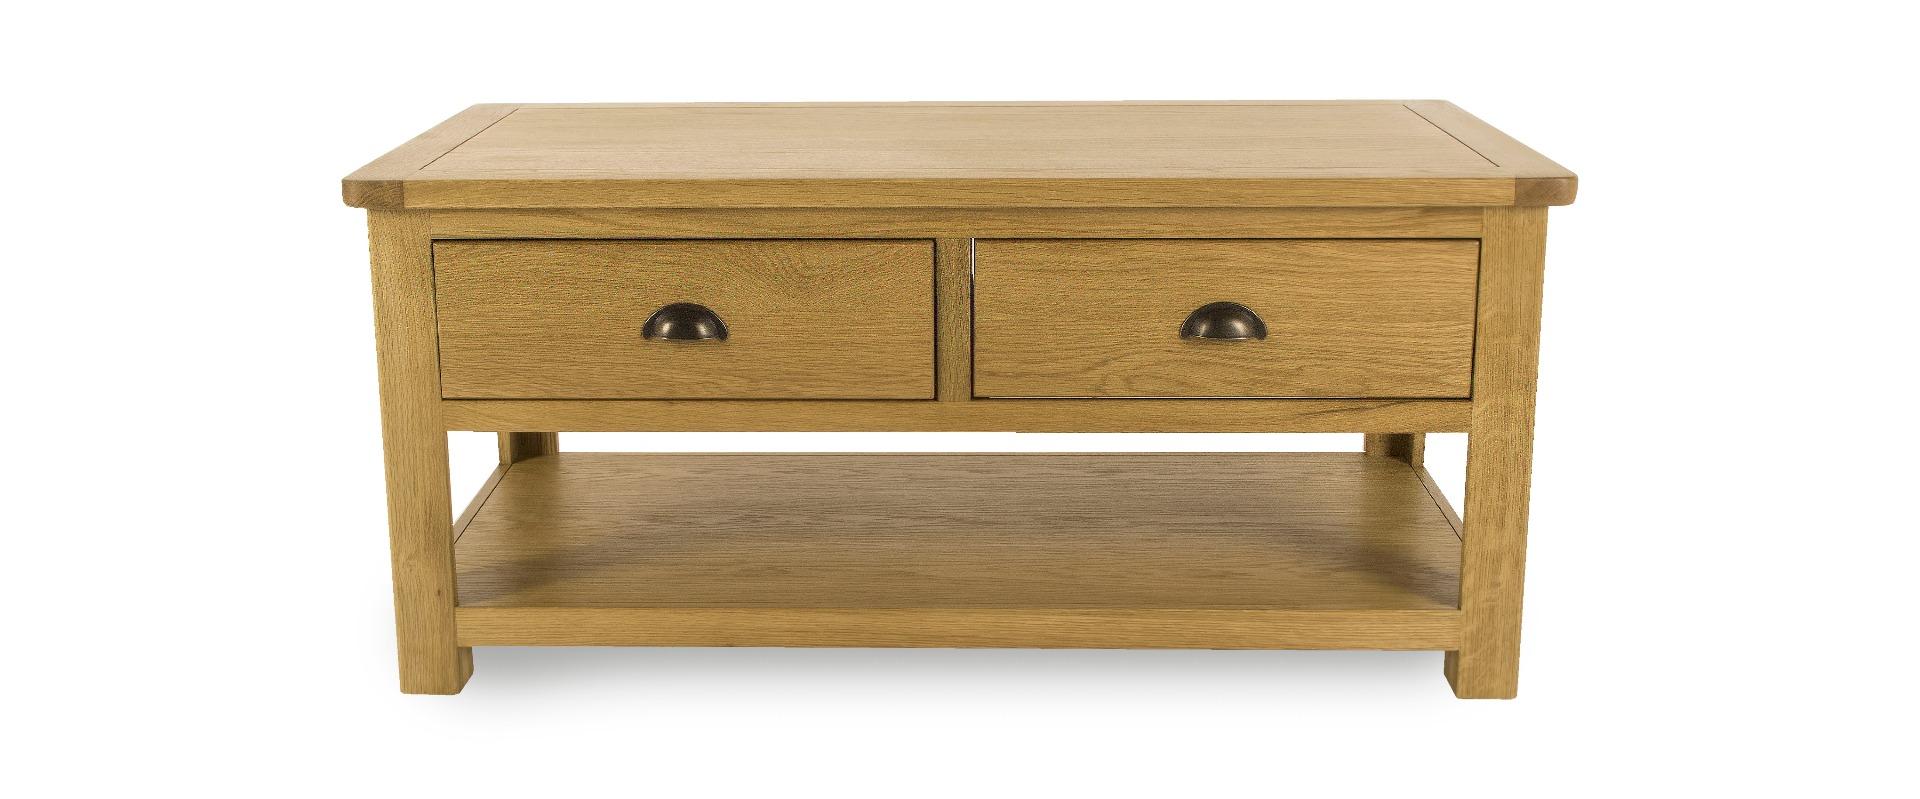 ab2cb3f345 Wood & Glass Coffee Tables | EZ Living Interiors Ireland